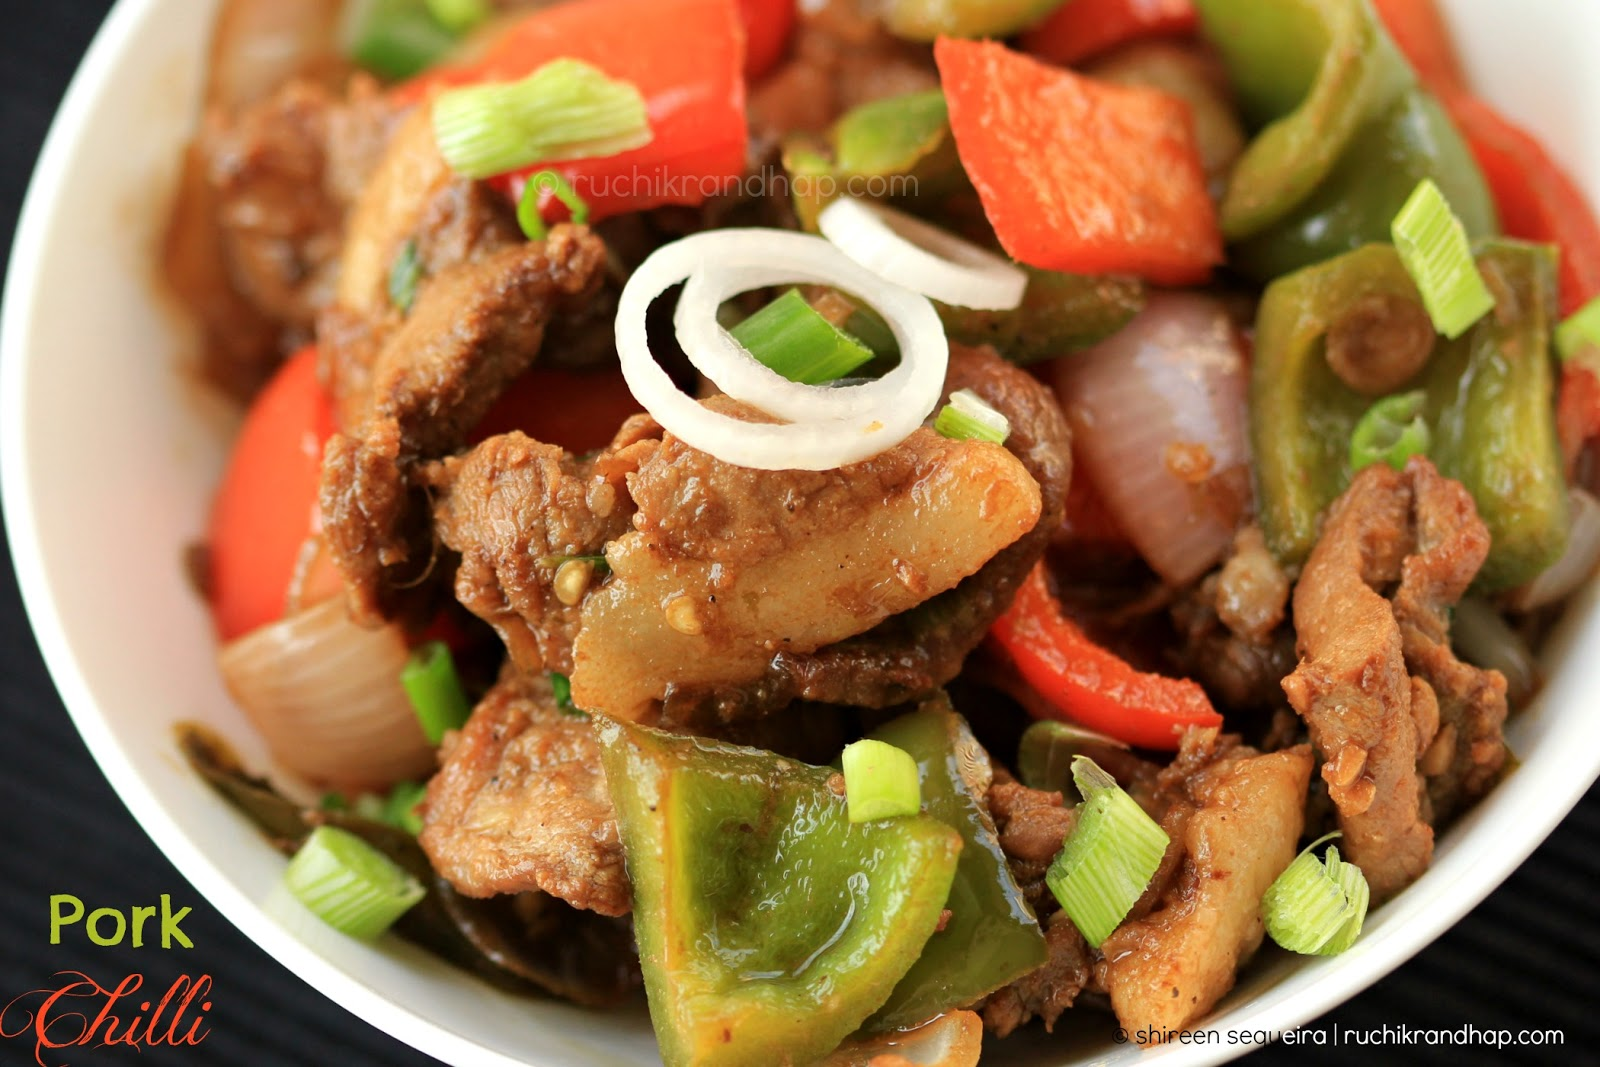 Pork Chilli Ruchik Randhap